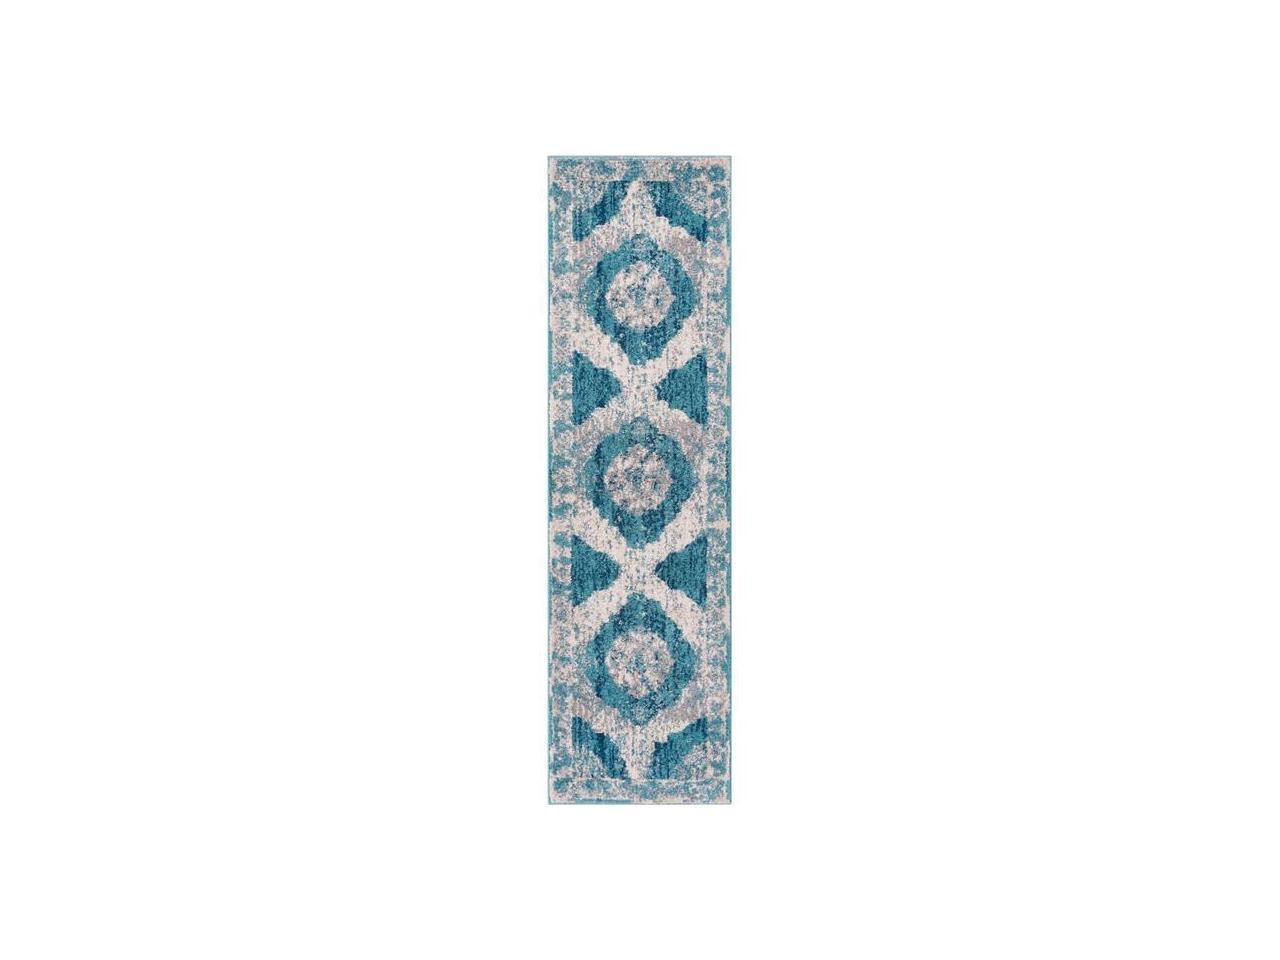 21 x 73 Runner Well Woven Areva Machine Washable Teal Blue Vintage Oriental Medallion Flat Pile Runner Rug 2x7